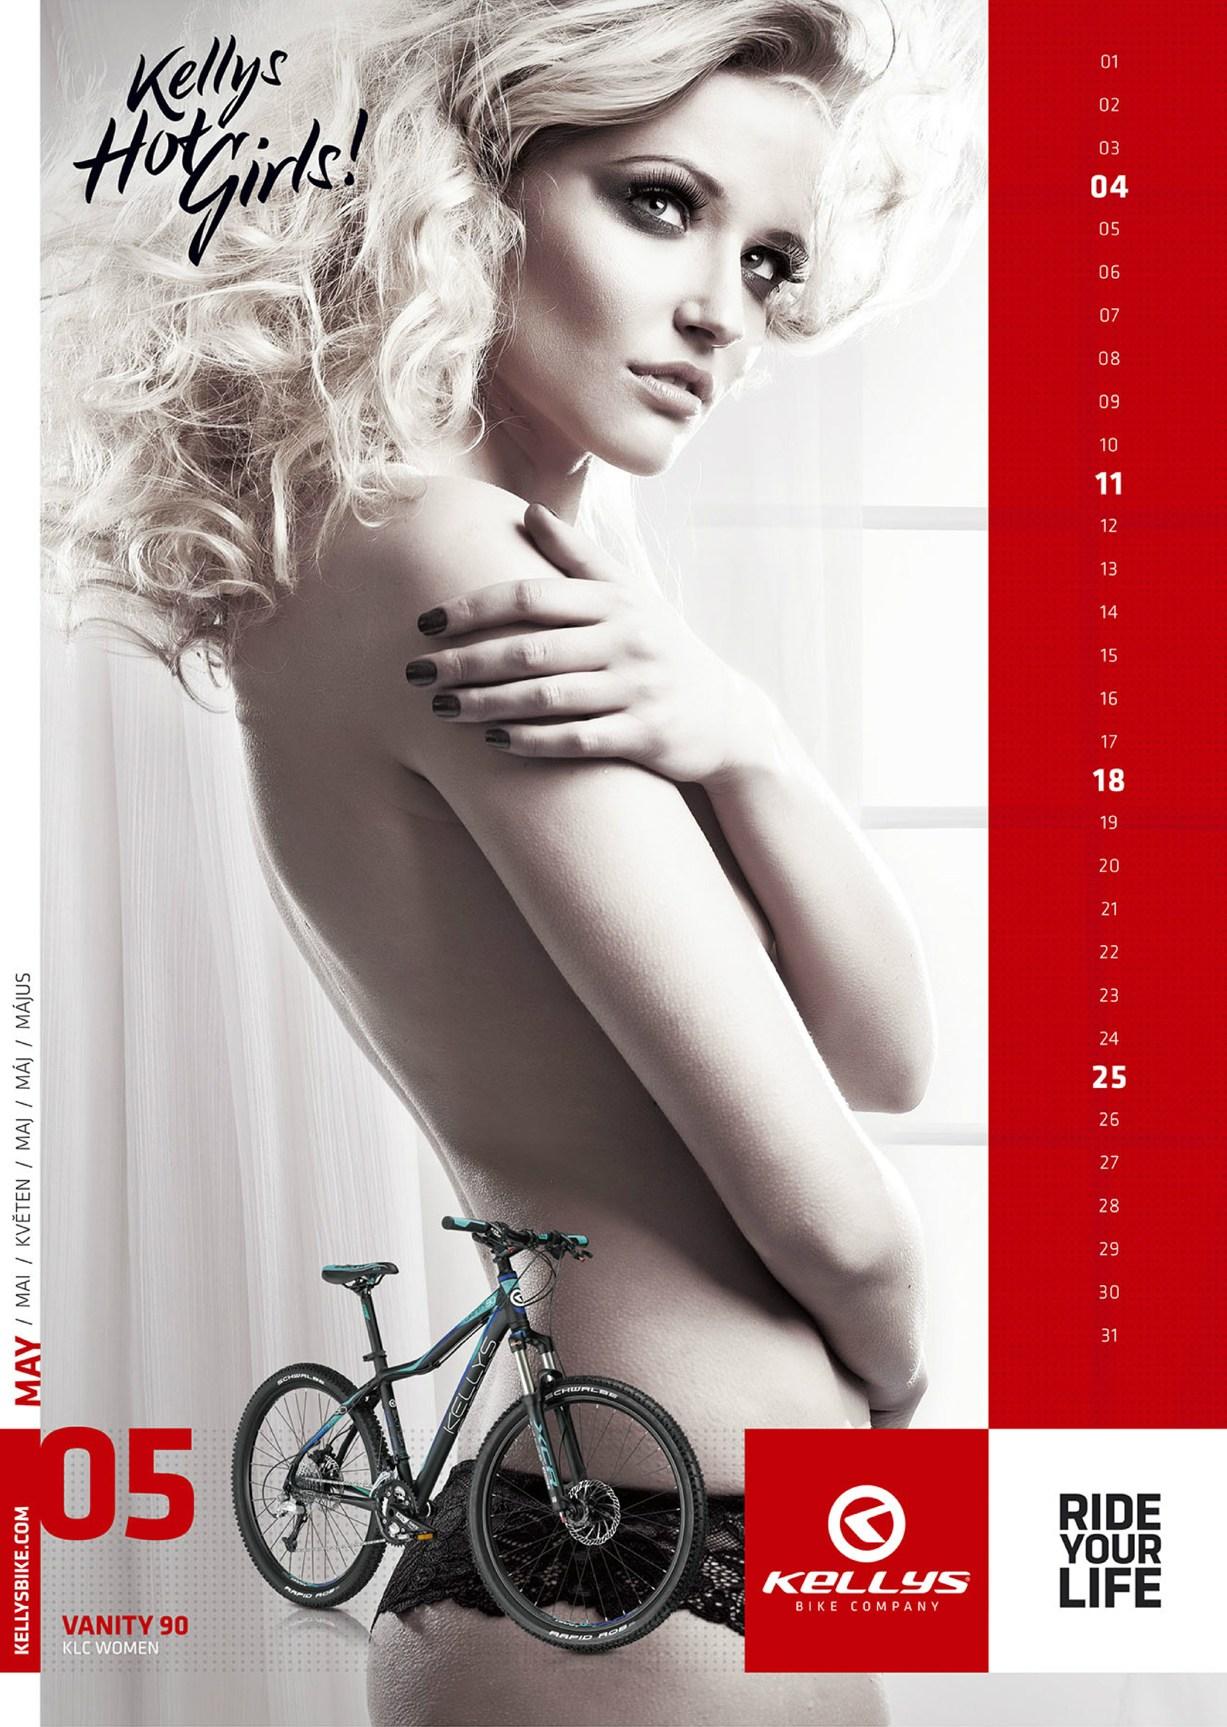 12 горячих красоток в календаре Kellys Hot Girls 2014